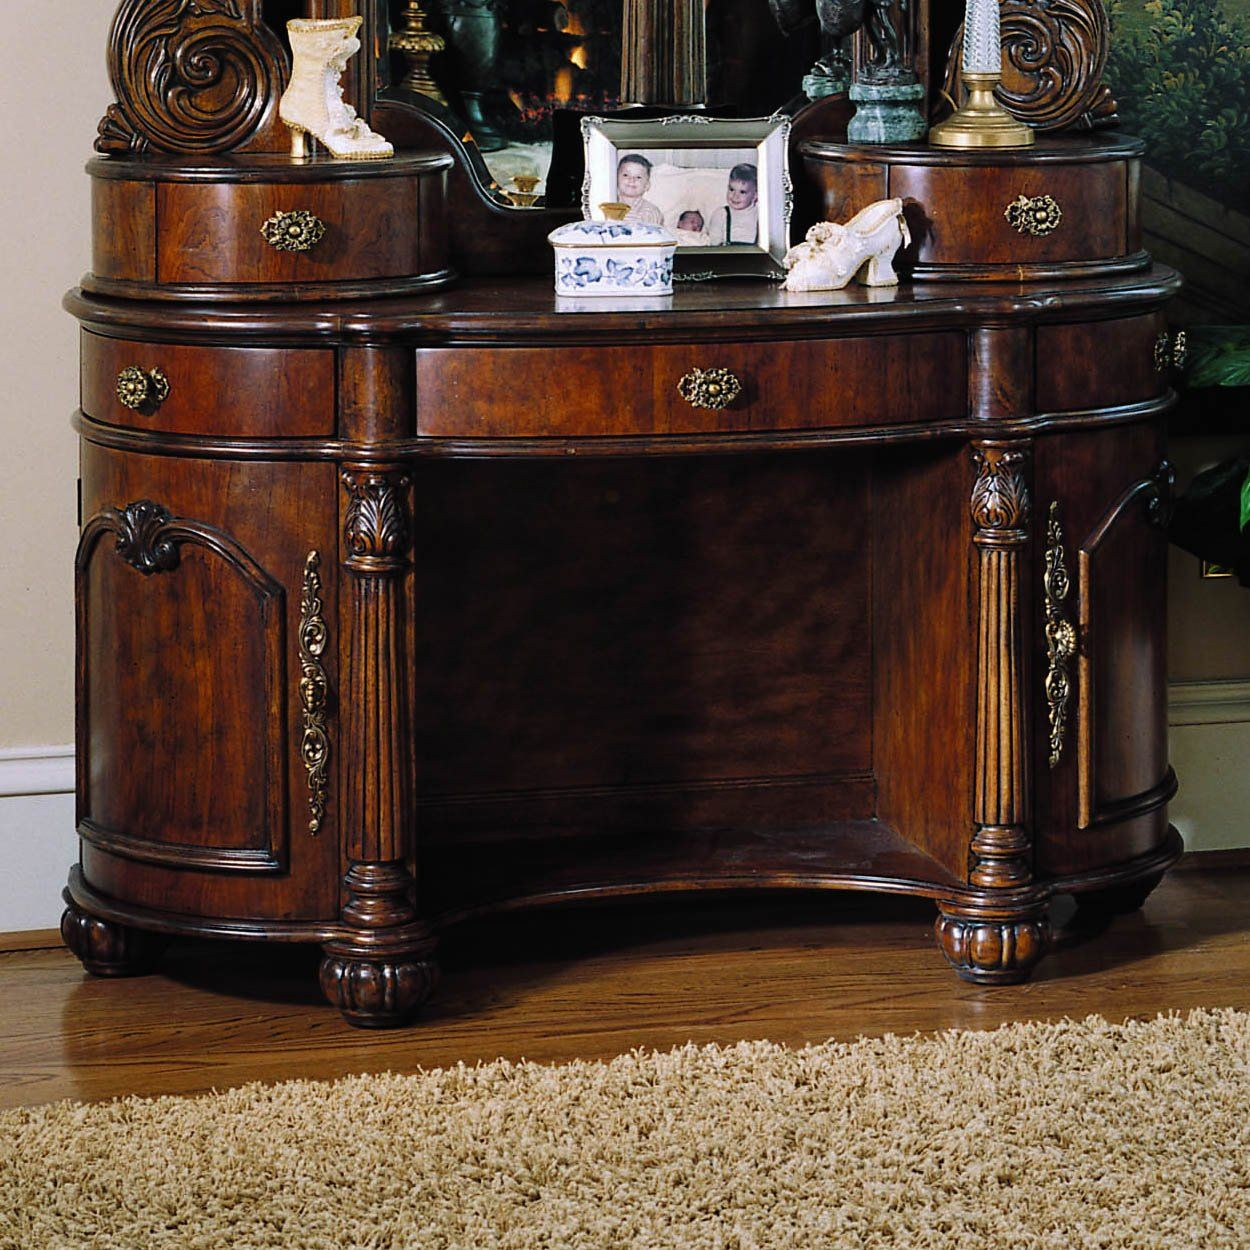 Ski Furniture 242127 Bedroom Vanity Edwardian 1500